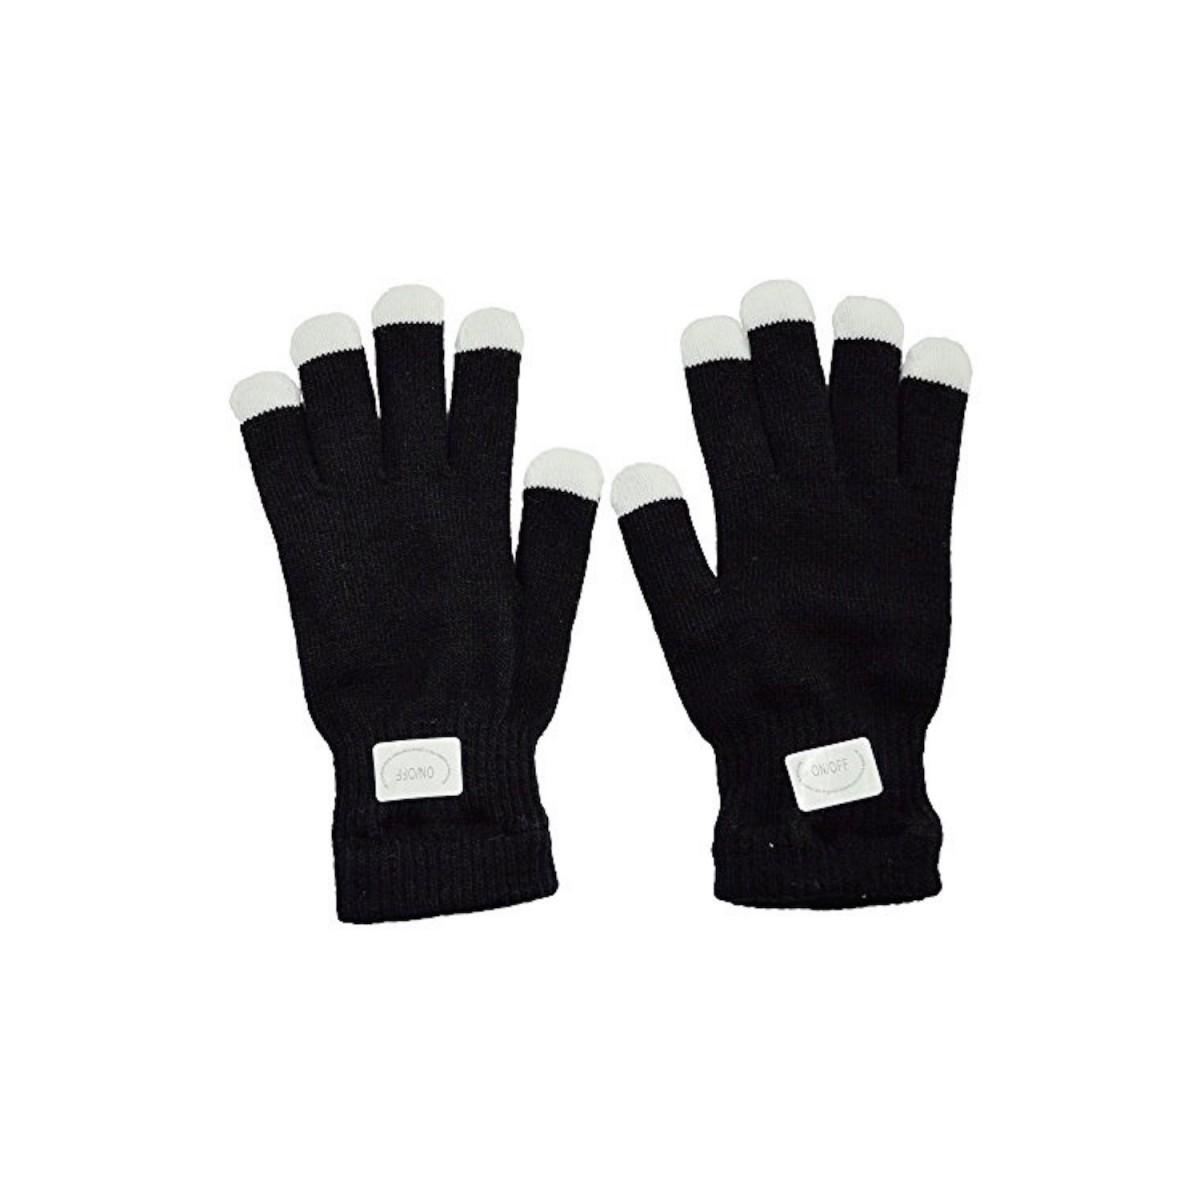 Coppia di guanti luminosi